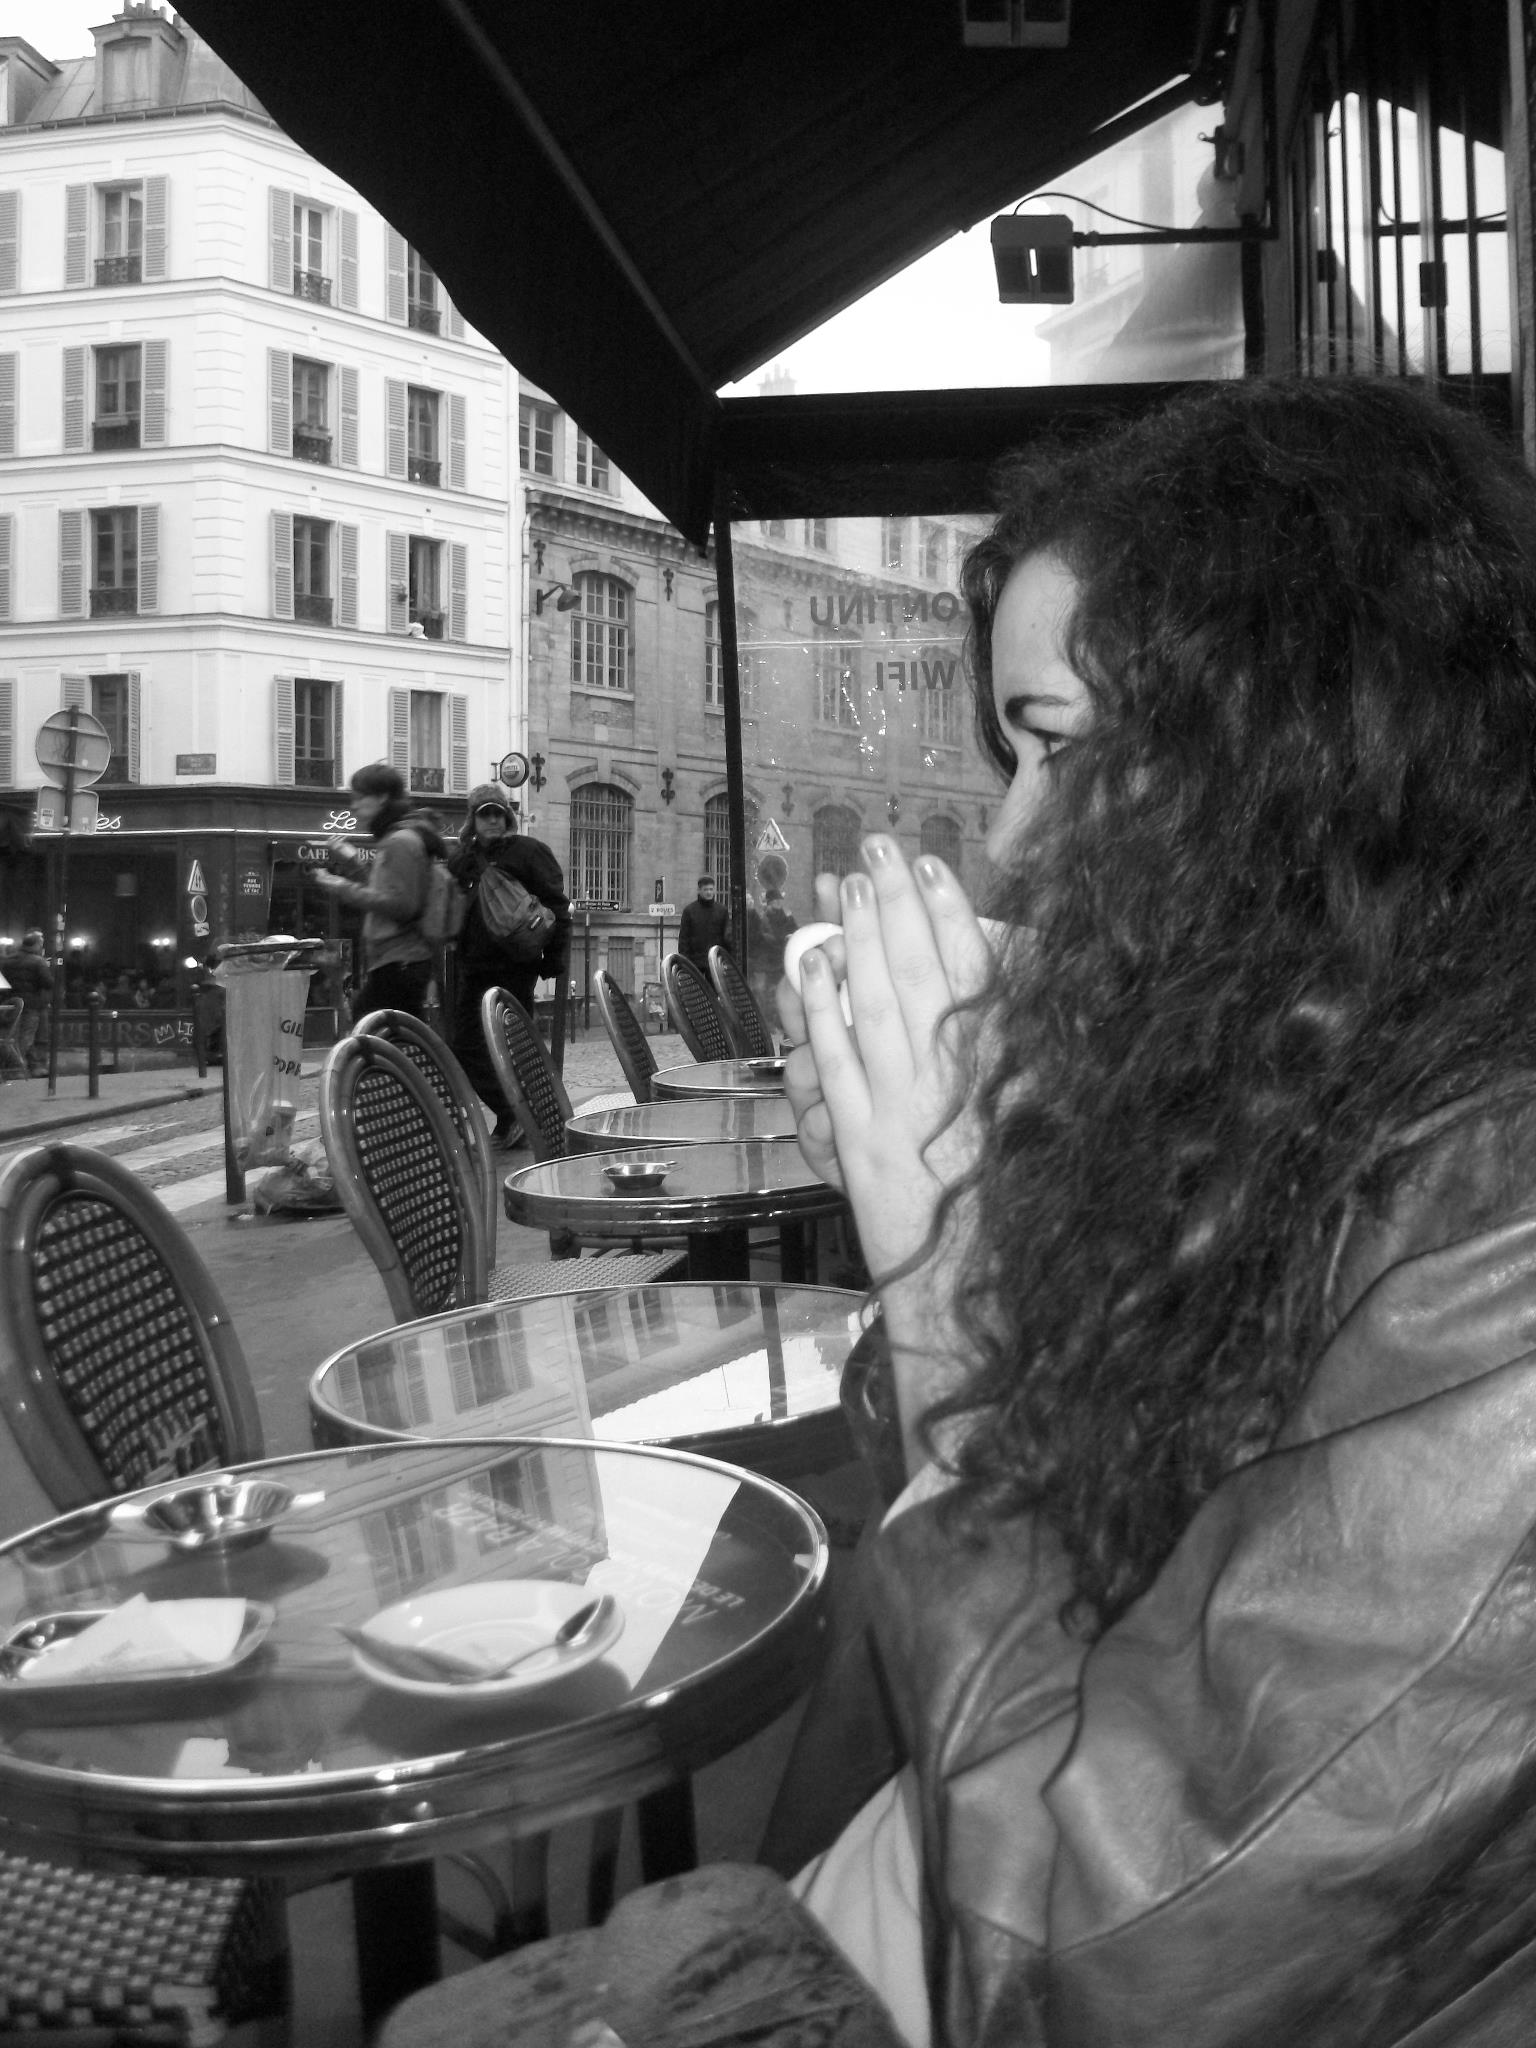 alone in cafes.jpg